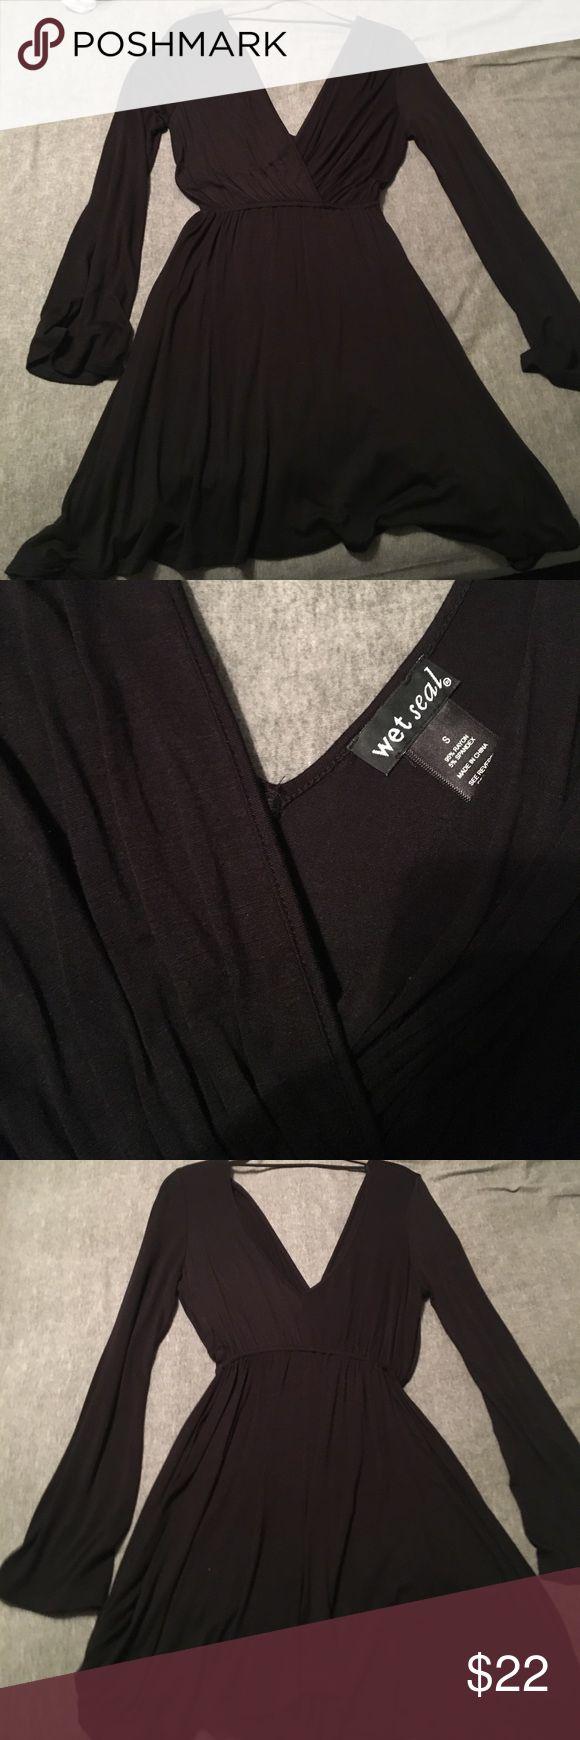 Wet Seal black dress Wet Seal black dress. Plunging neck line, flowy bottom & flowy long sleeves. Great condition. Wet Seal Dresses Long Sleeve